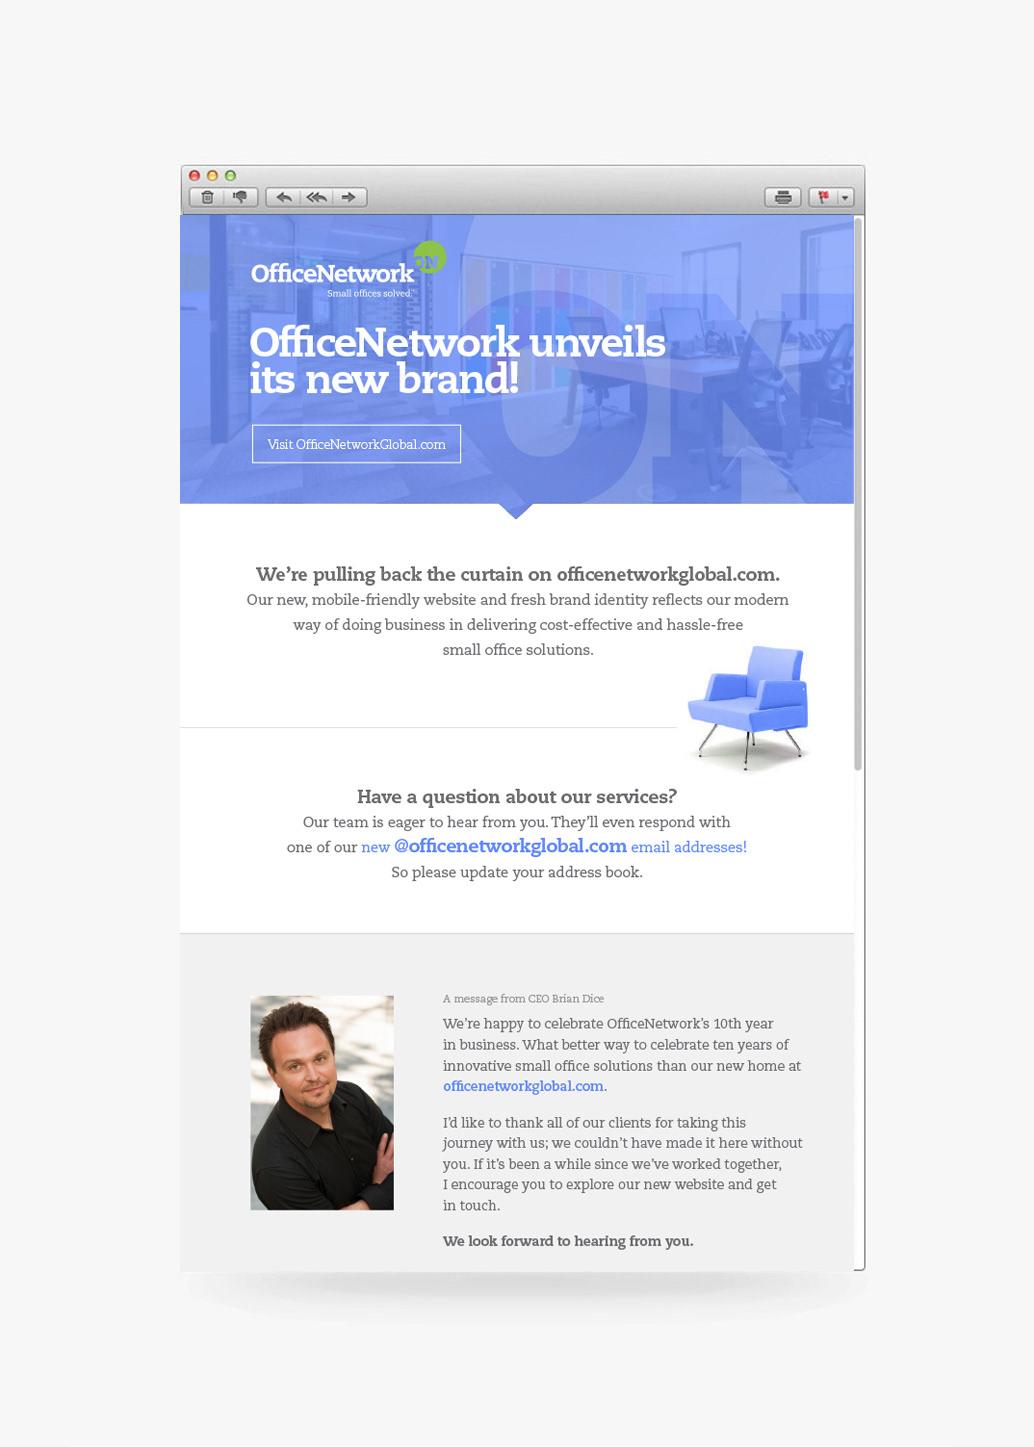 holland freund design office network global